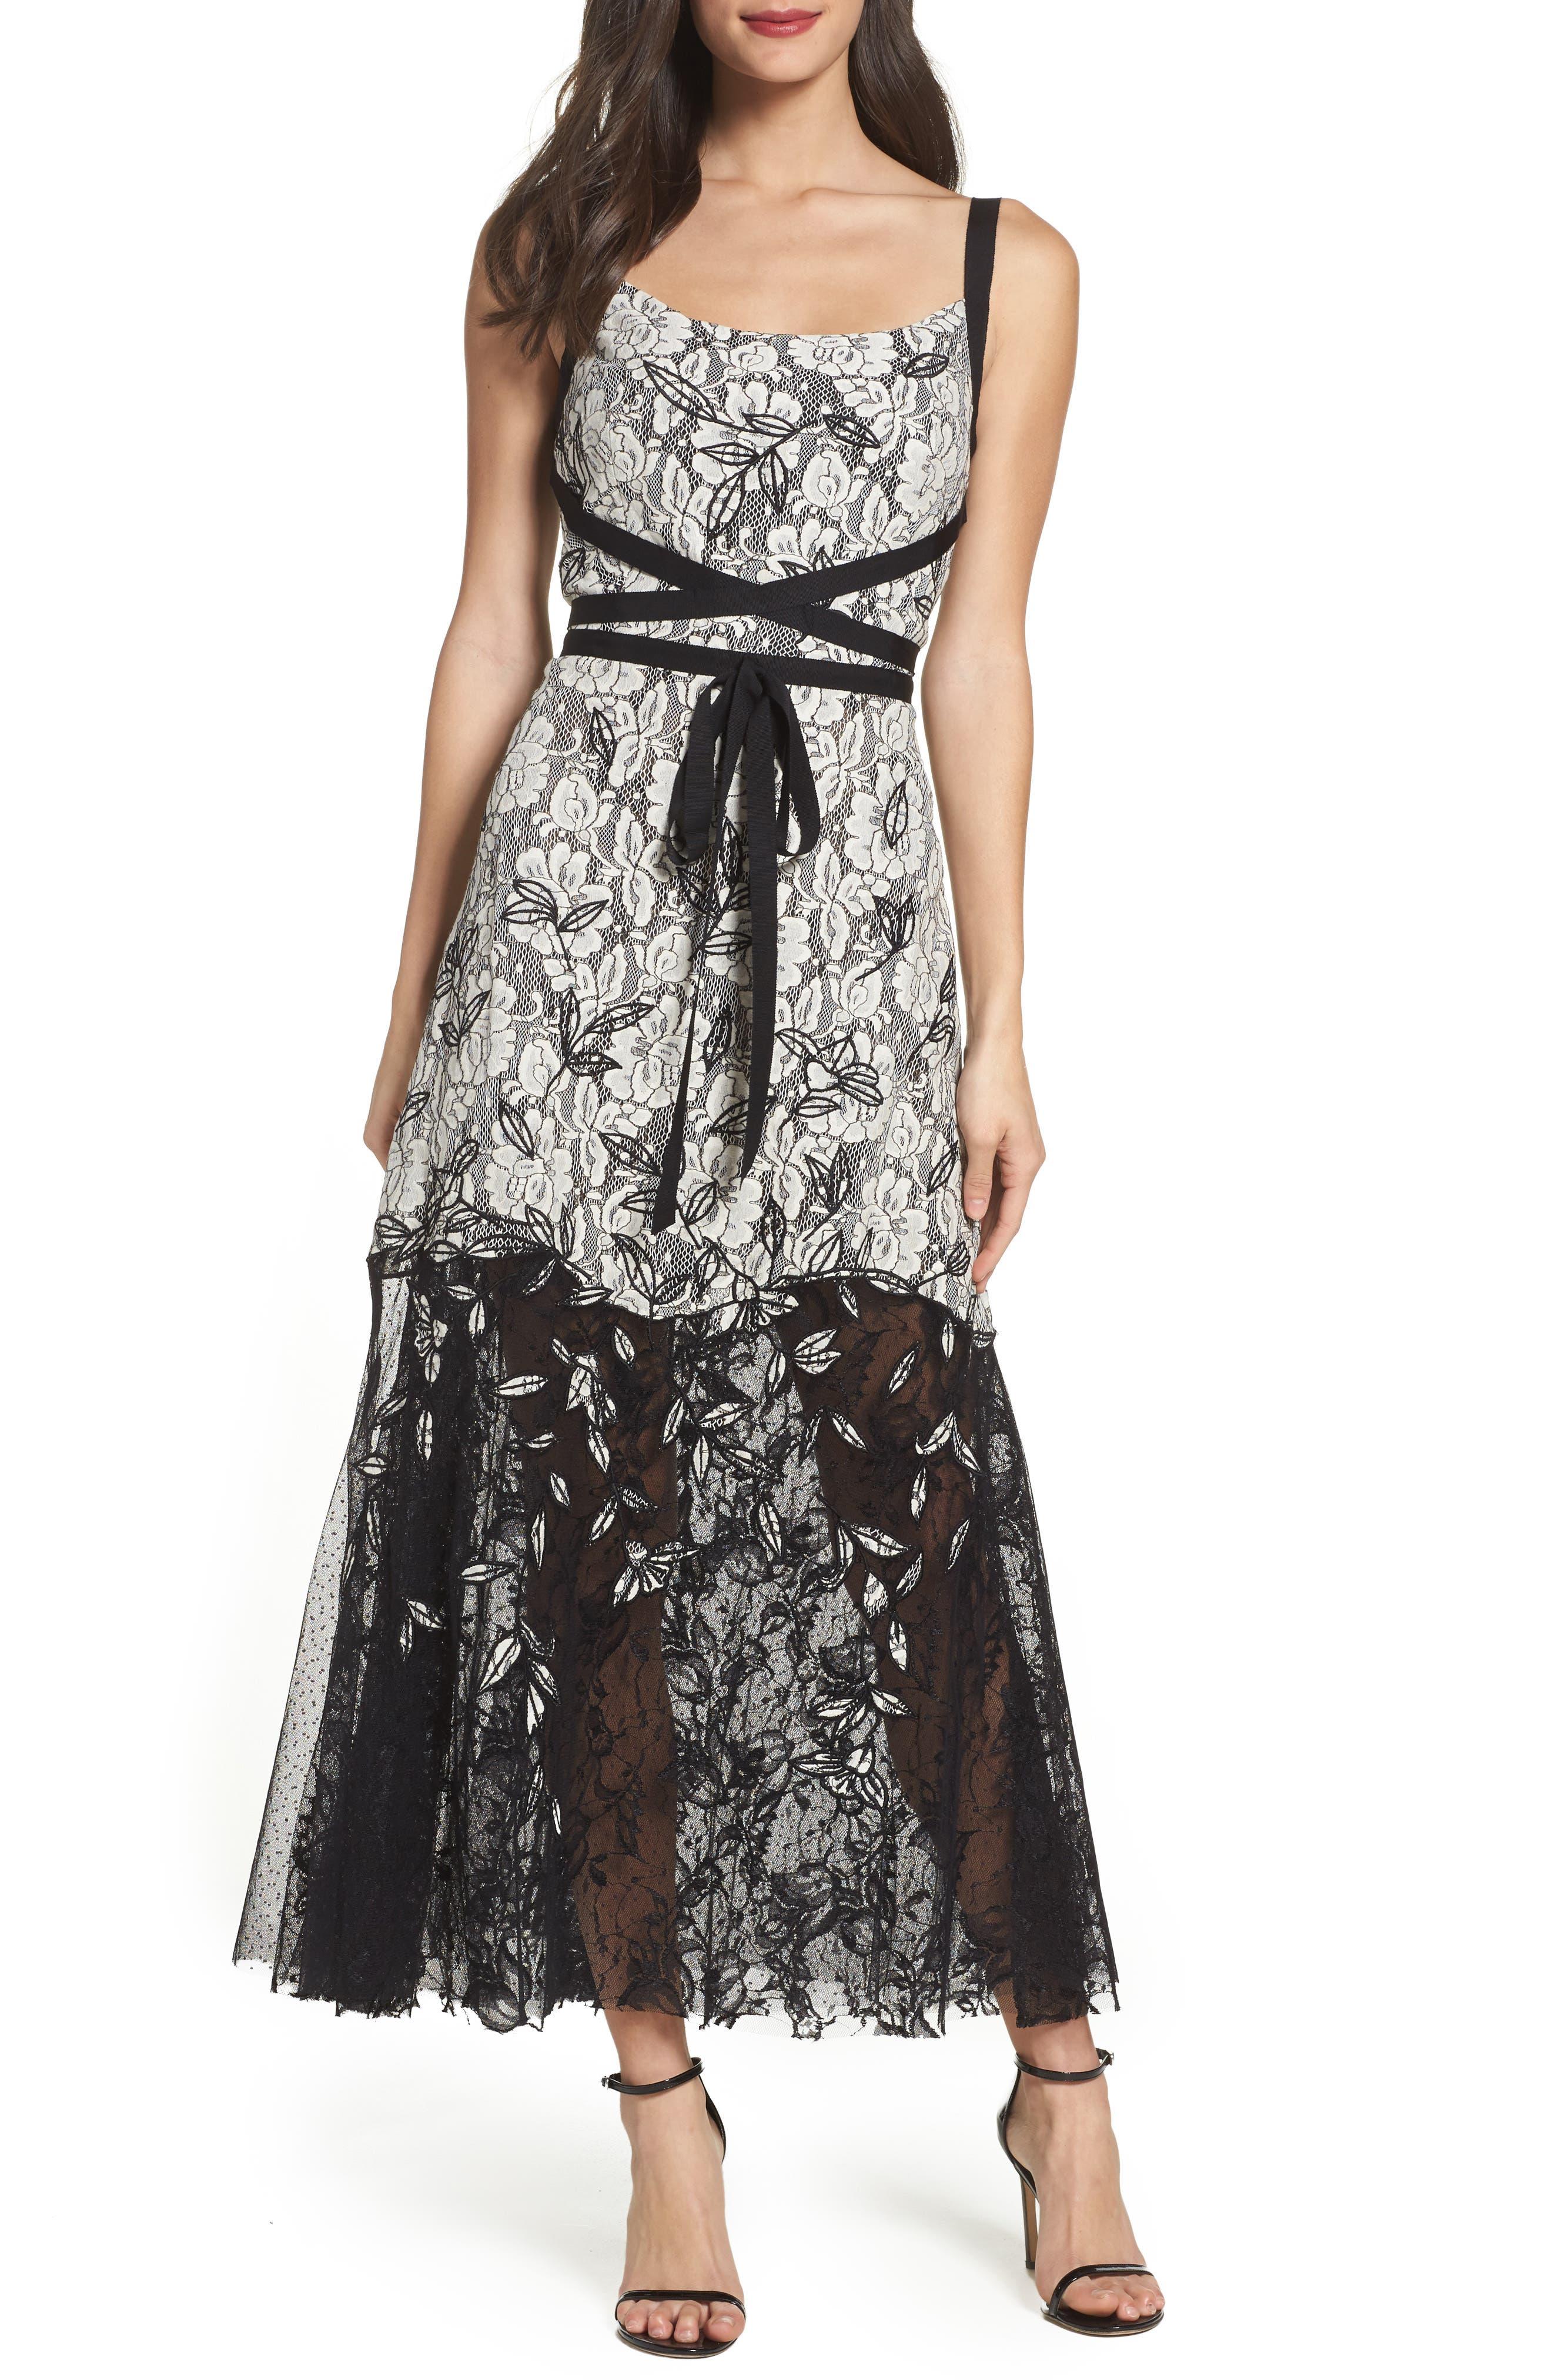 Alternate Image 1 Selected - Sachin & Babi Noir Rose Lace Gown